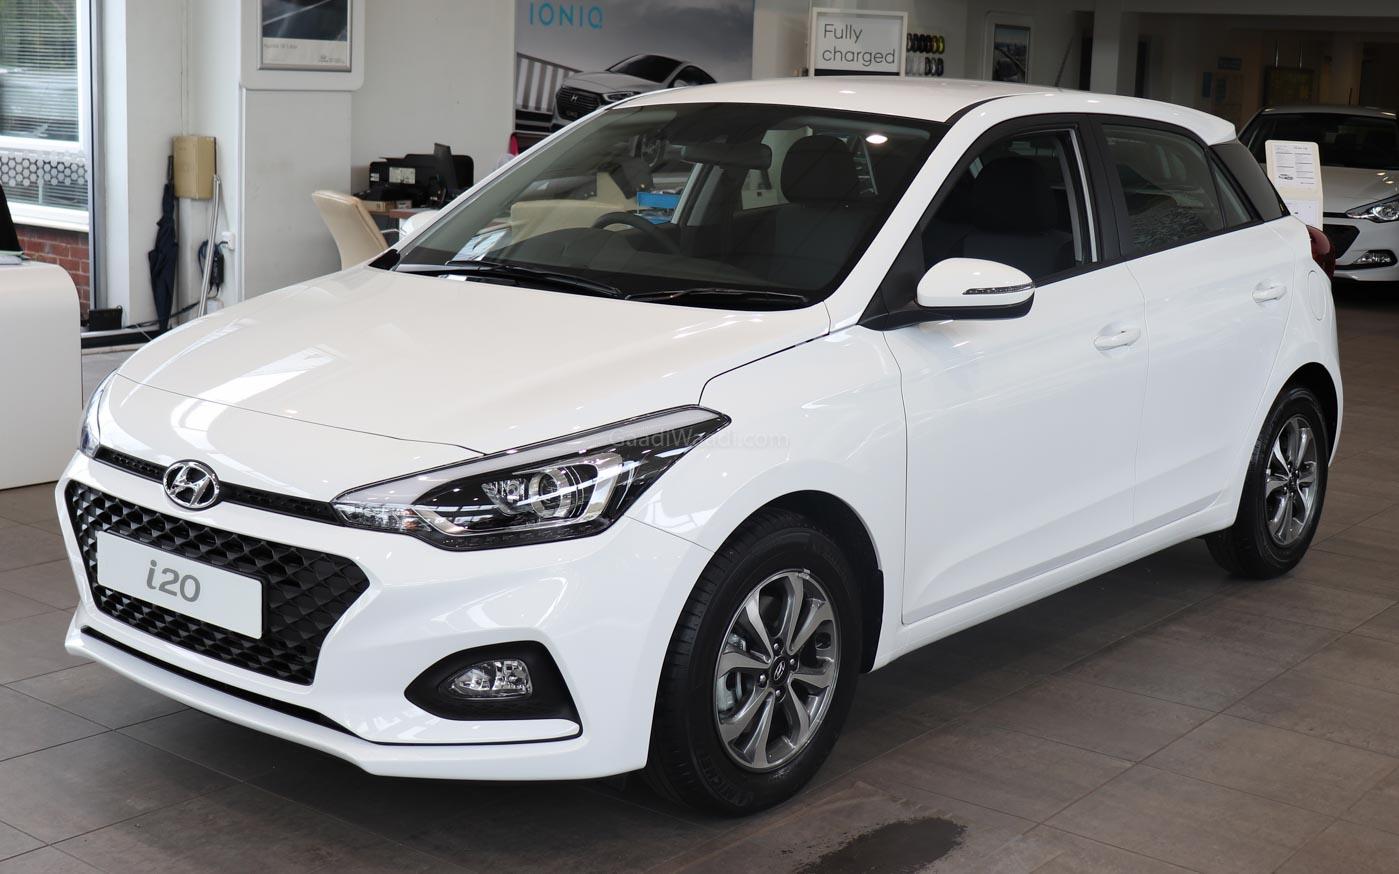 Hyundai May 2020 Discount Details – Grand i10, i20, Santro, Venue, Creta